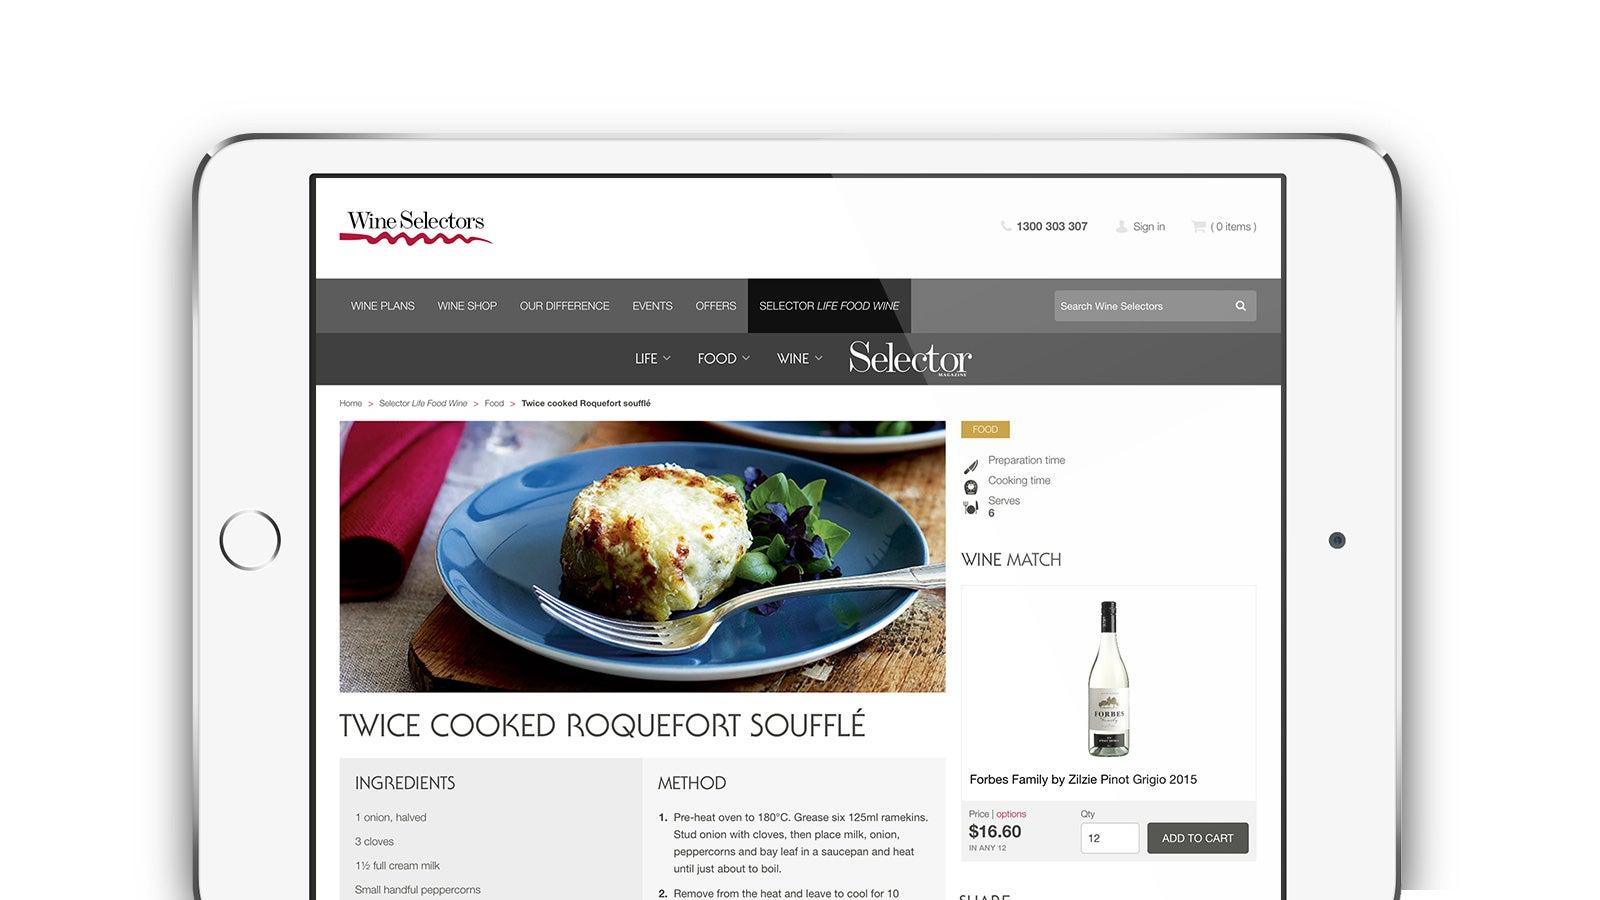 Wine Selectors | Recipe page on iPad | Devotion